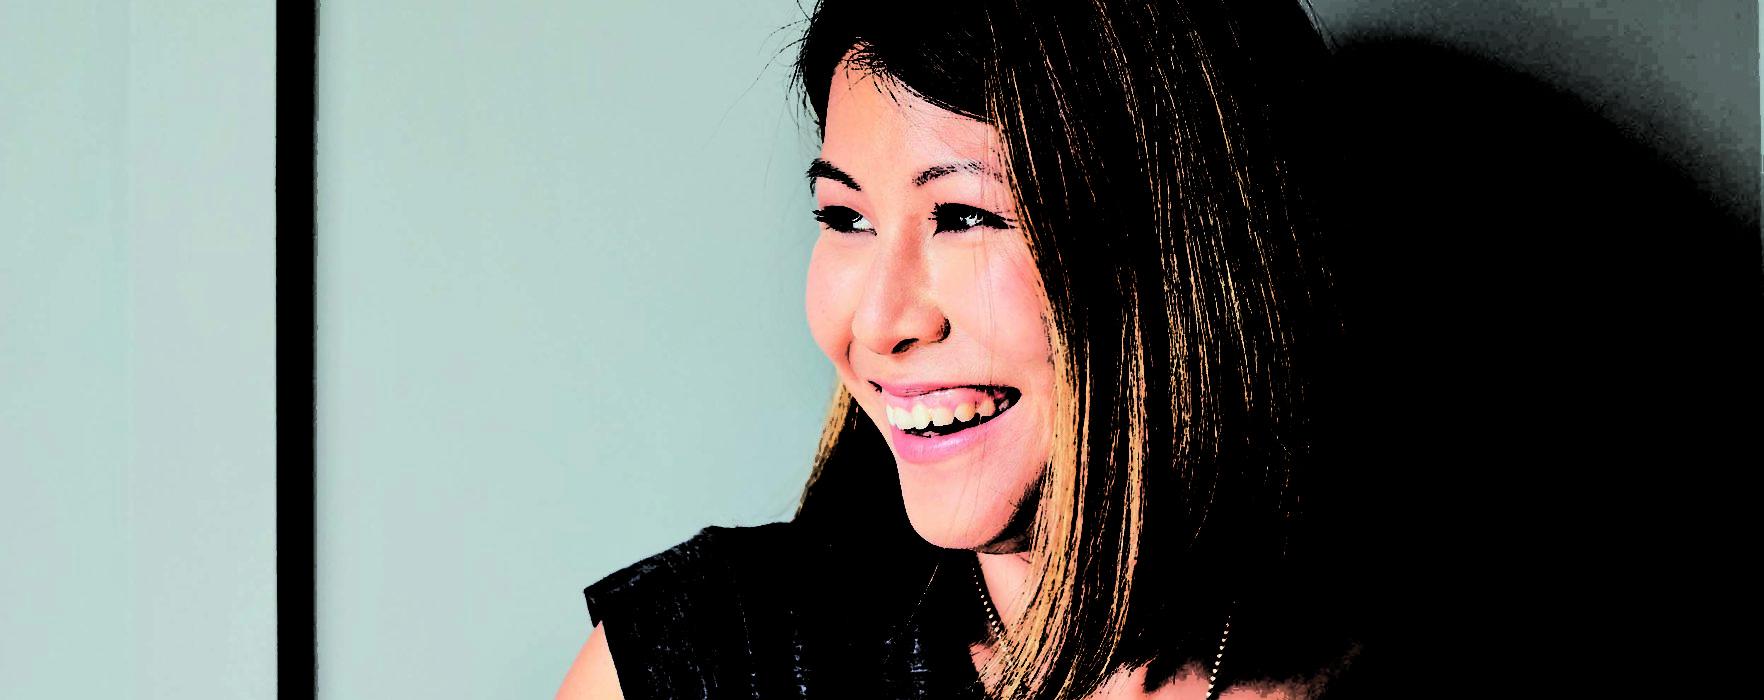 MasterChef champion launches Ping Pan-Asian delicatessen at Selfridges Trafford Centre